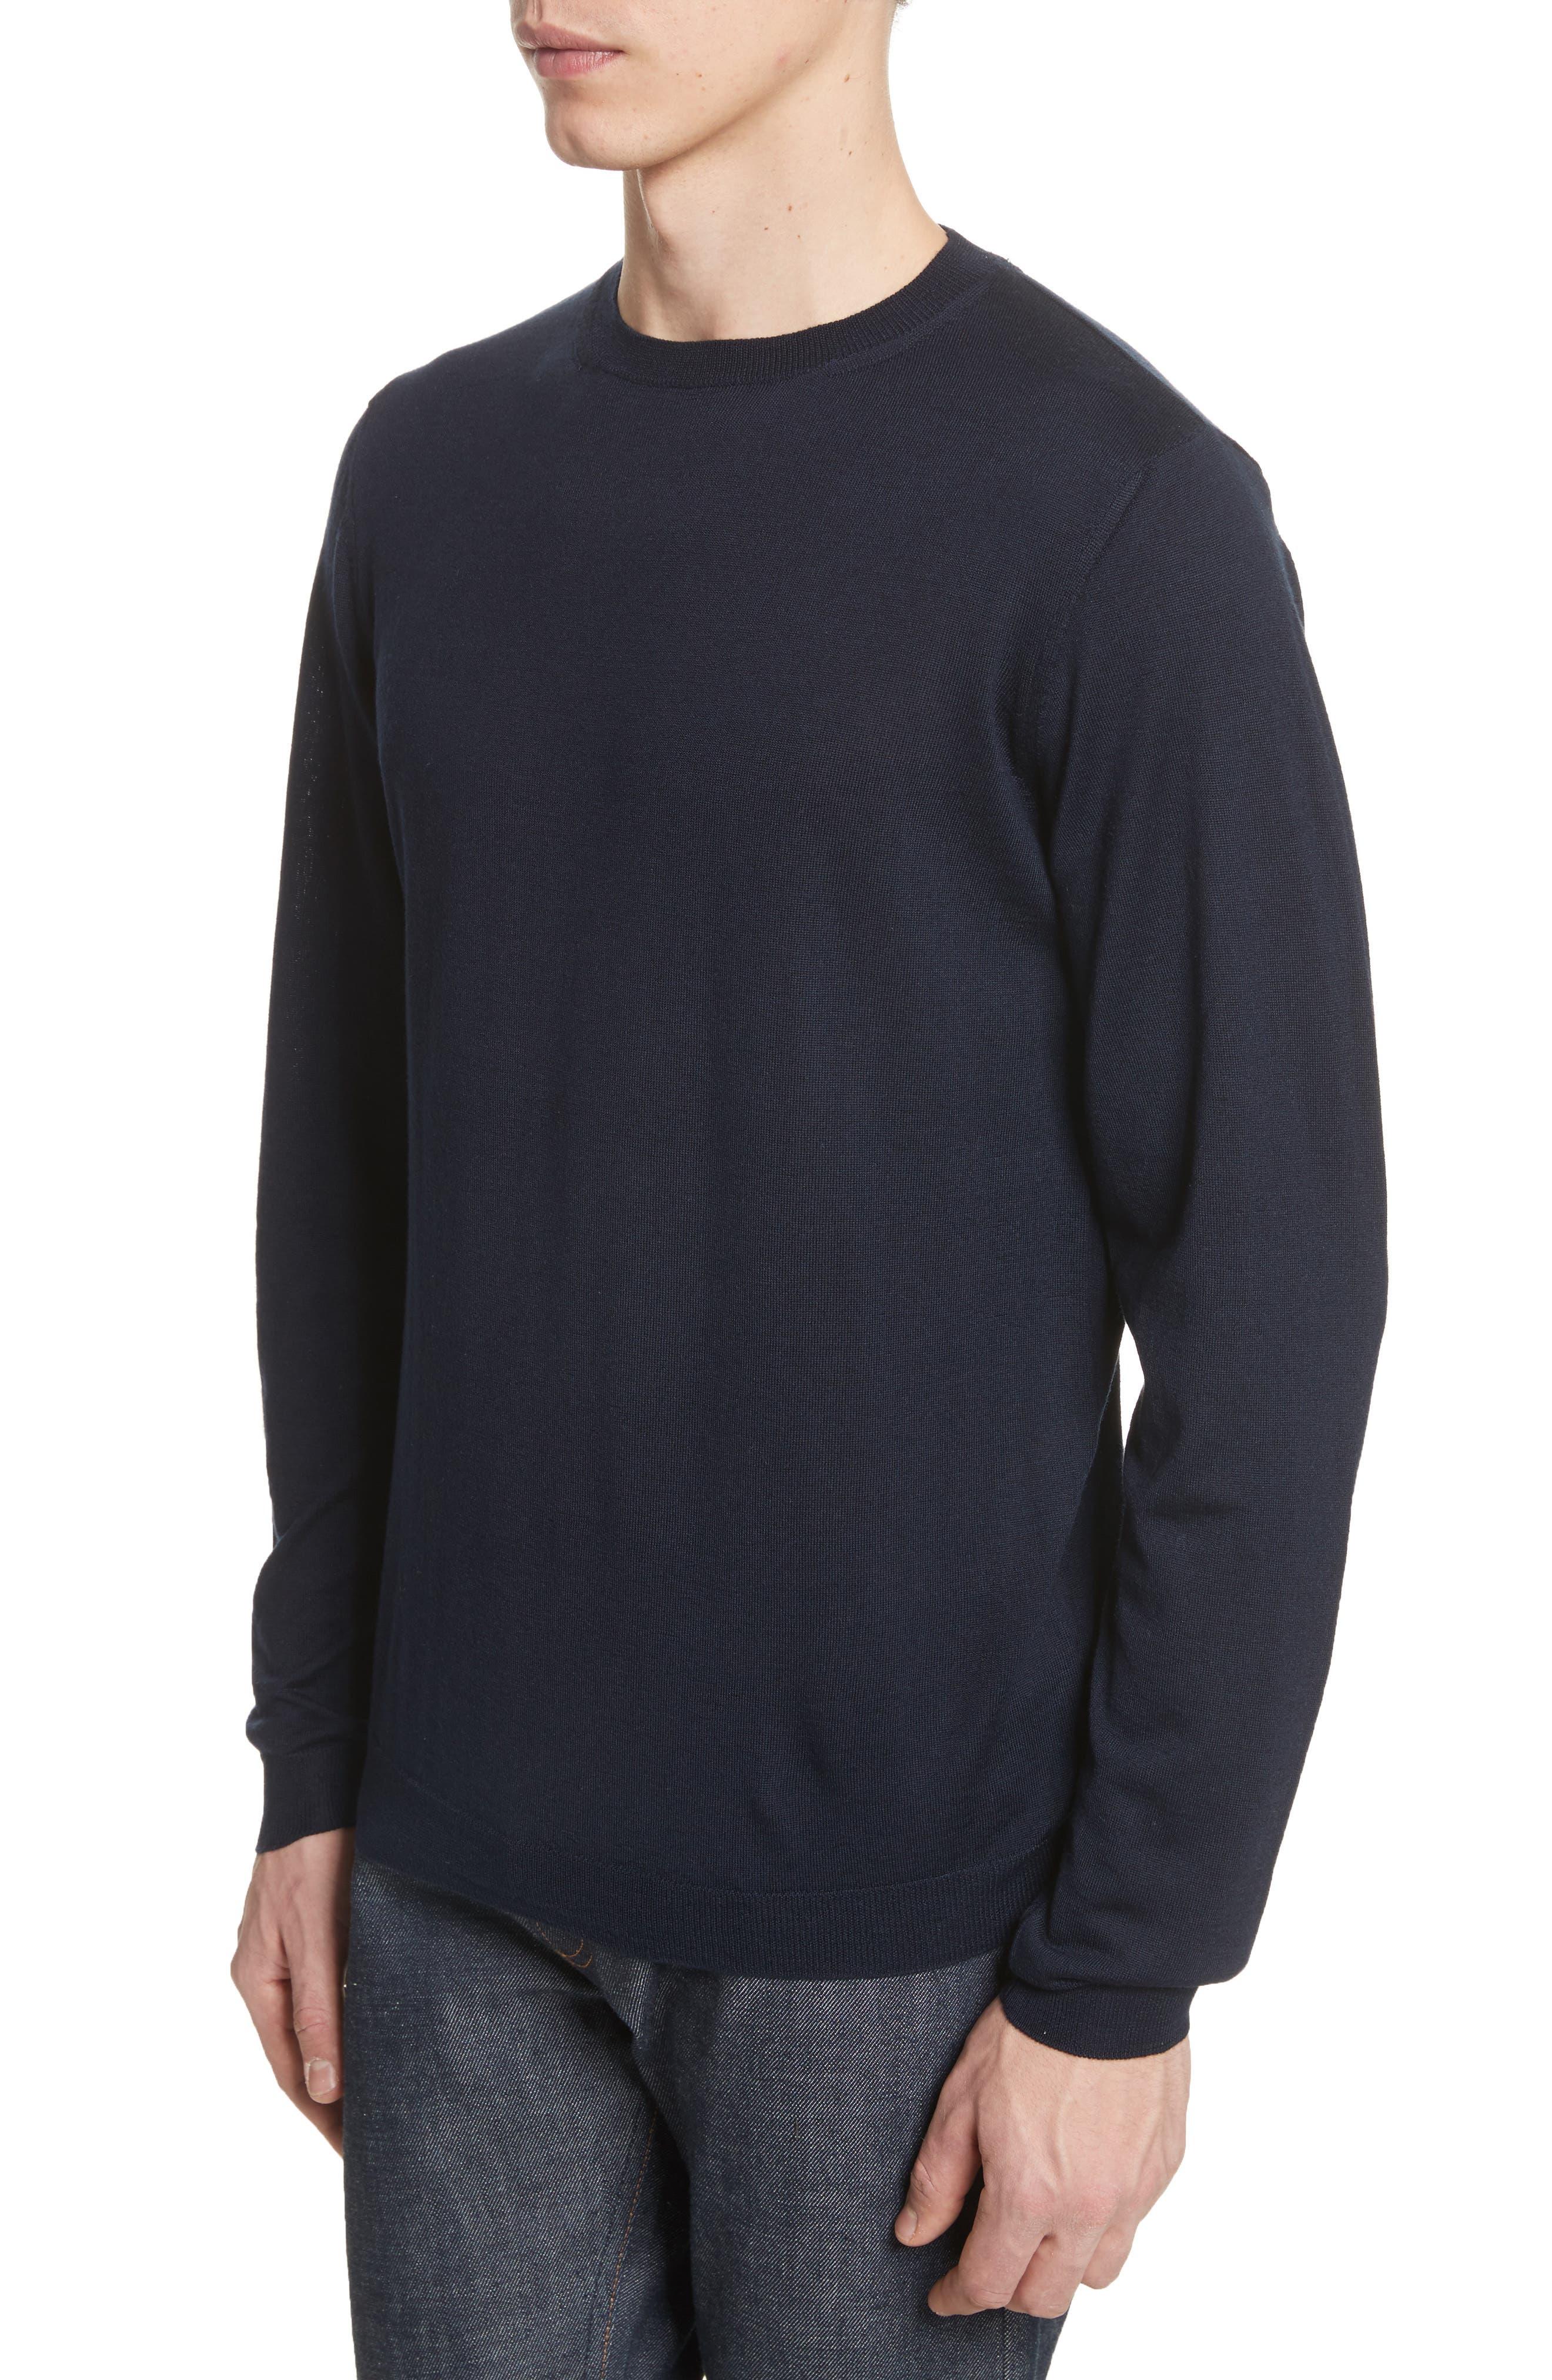 Sigfred Merino Wool & Silk Crewneck Sweater,                             Alternate thumbnail 4, color,                             Dark Navy